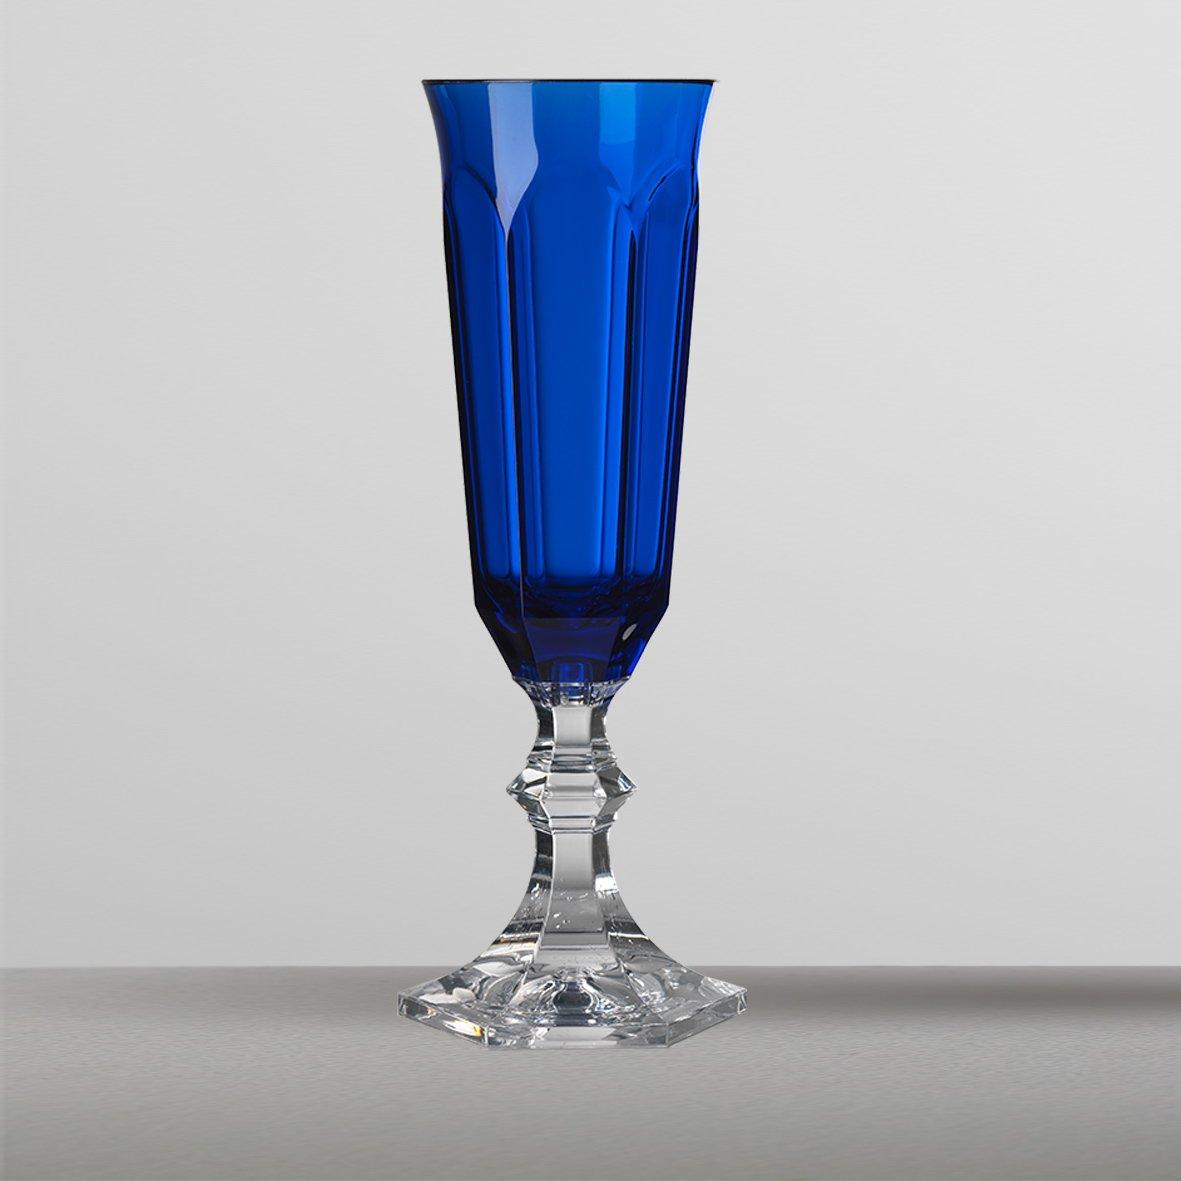 Mario Luca Giustiセット6 Dolce Vitaフルートガラスブルー B01MYLD6ZI